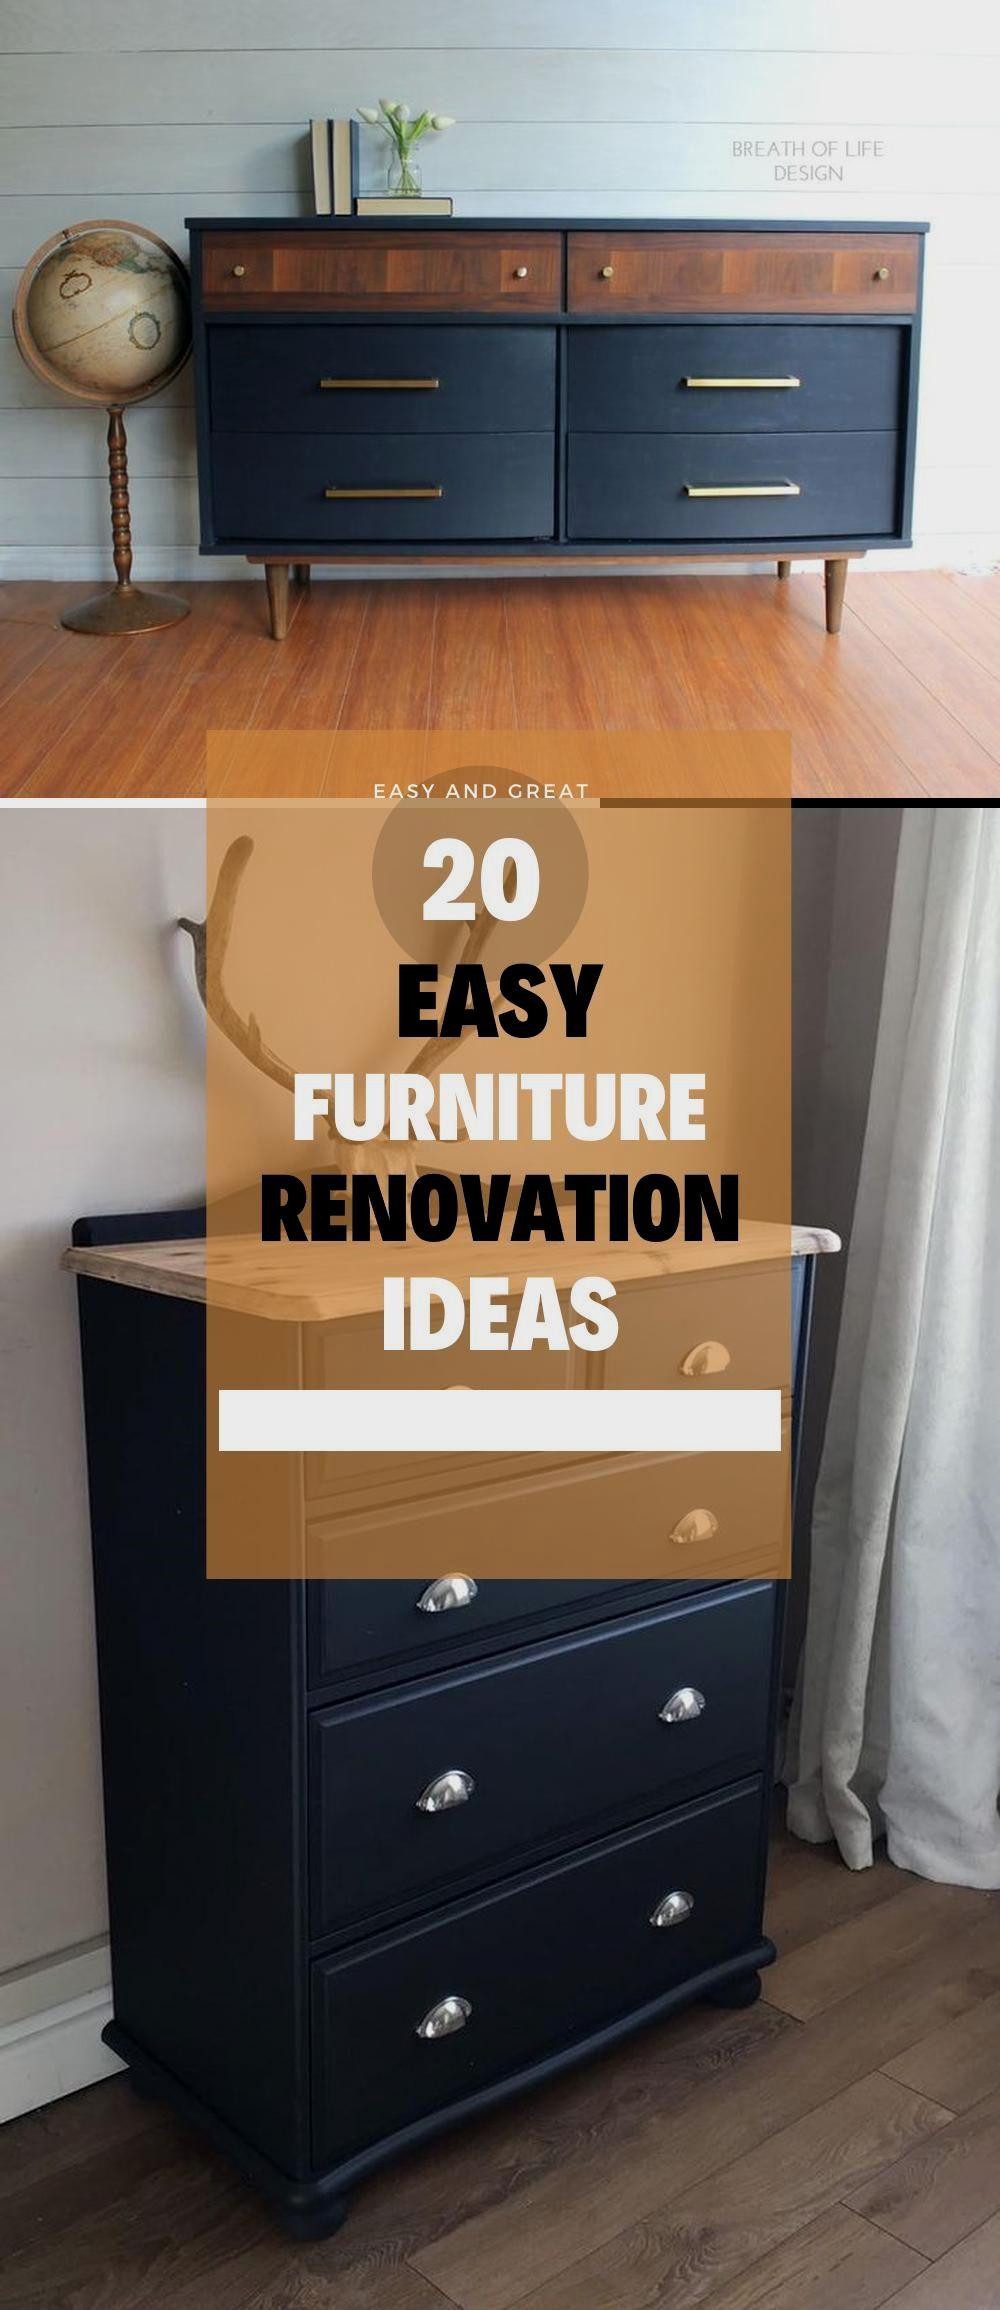 Cheap Furniture Repurposed Ideas In 2021 Diy Furniture Renovation Cheap Furniture Makeover Furniture Renovation